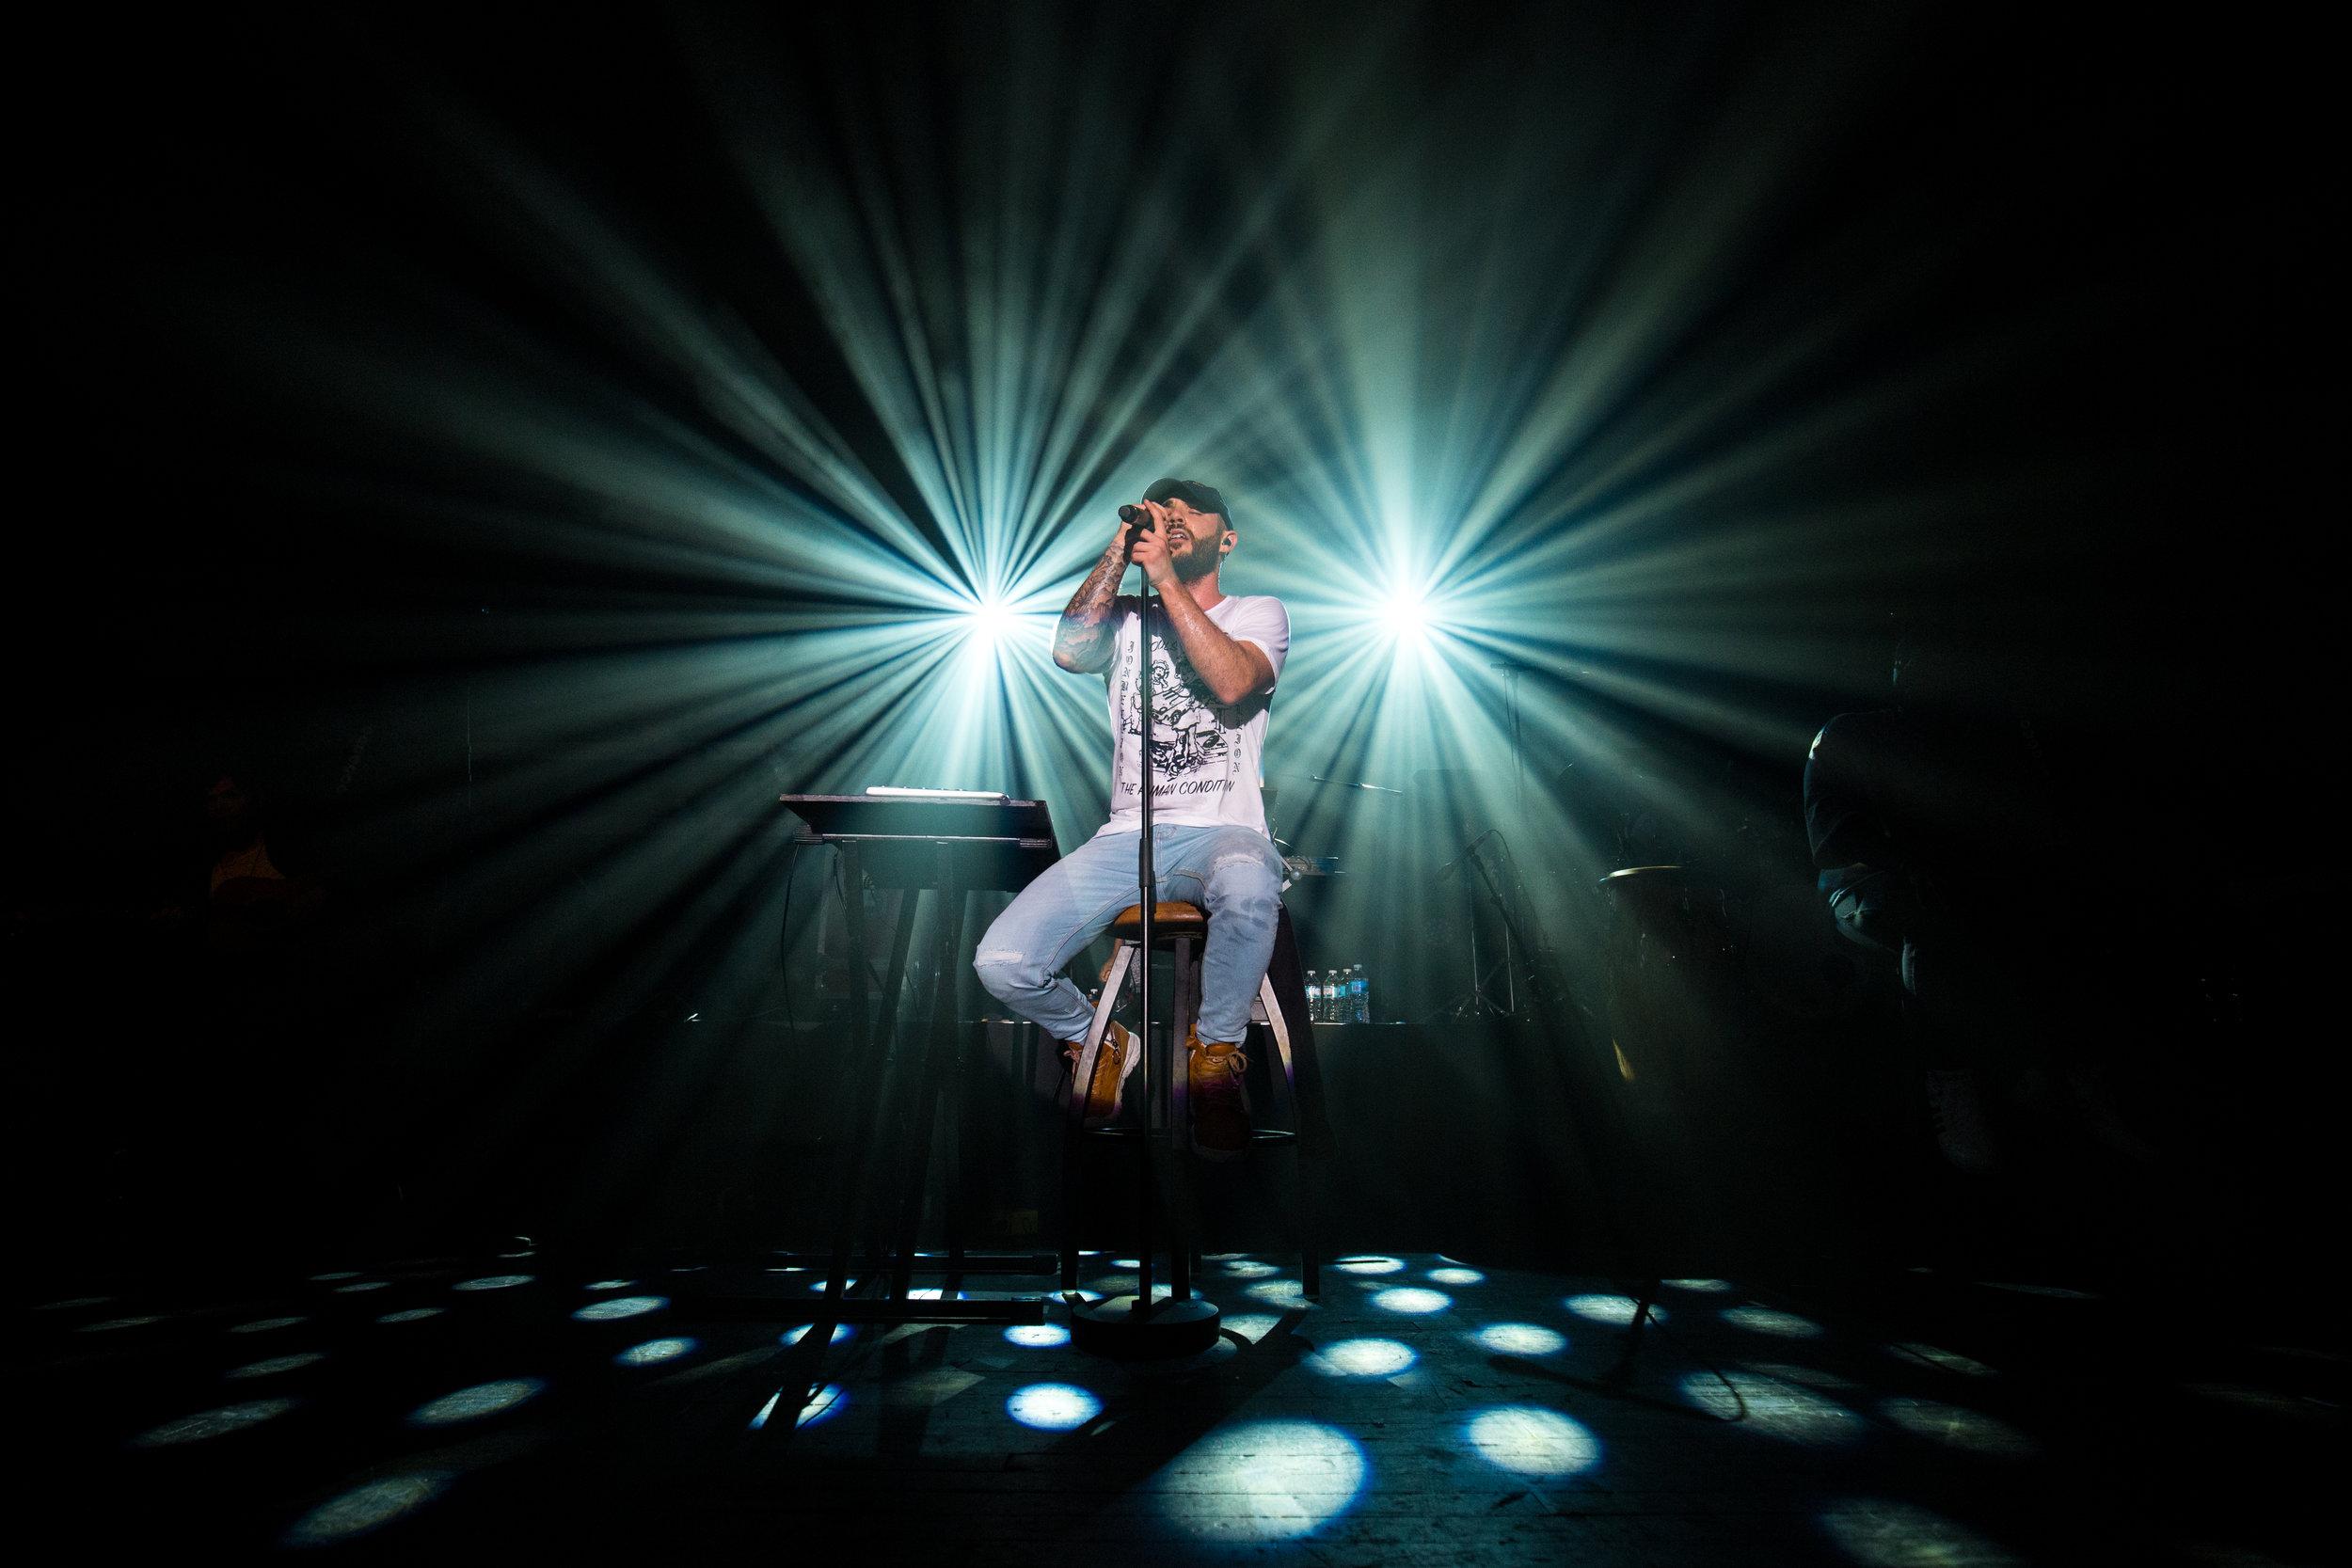 Jon Bellion  The Human Condition Tour Part II  2016